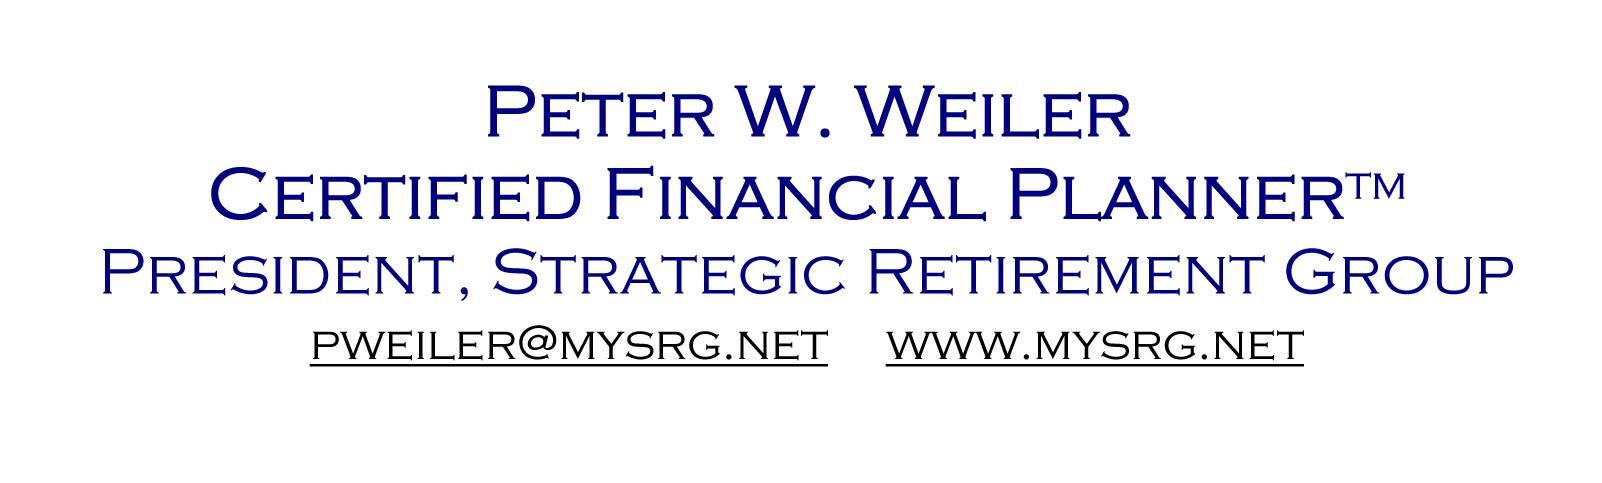 Peter W. Weiler Certified Financial Planner